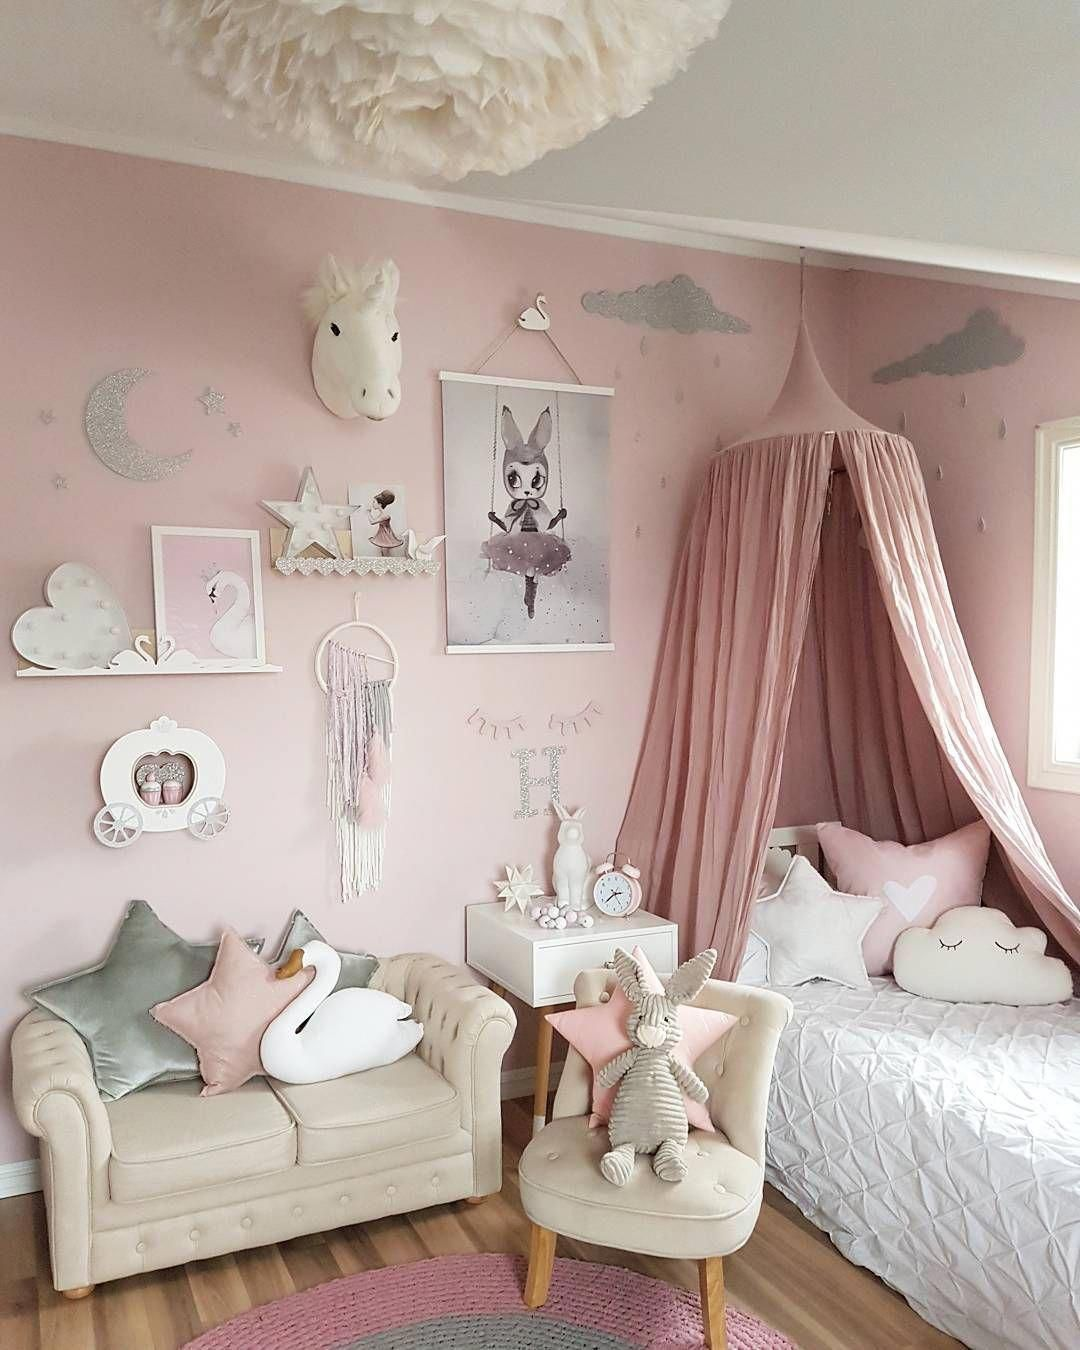 16 Girls Bedroom Paint Ideas 11 Year Old Girl Bedroom Ideas Girlsbedroomfurniture Do You Think He Or She Are Gonna Lik Jenterom Soverom For Jenter Barnerom